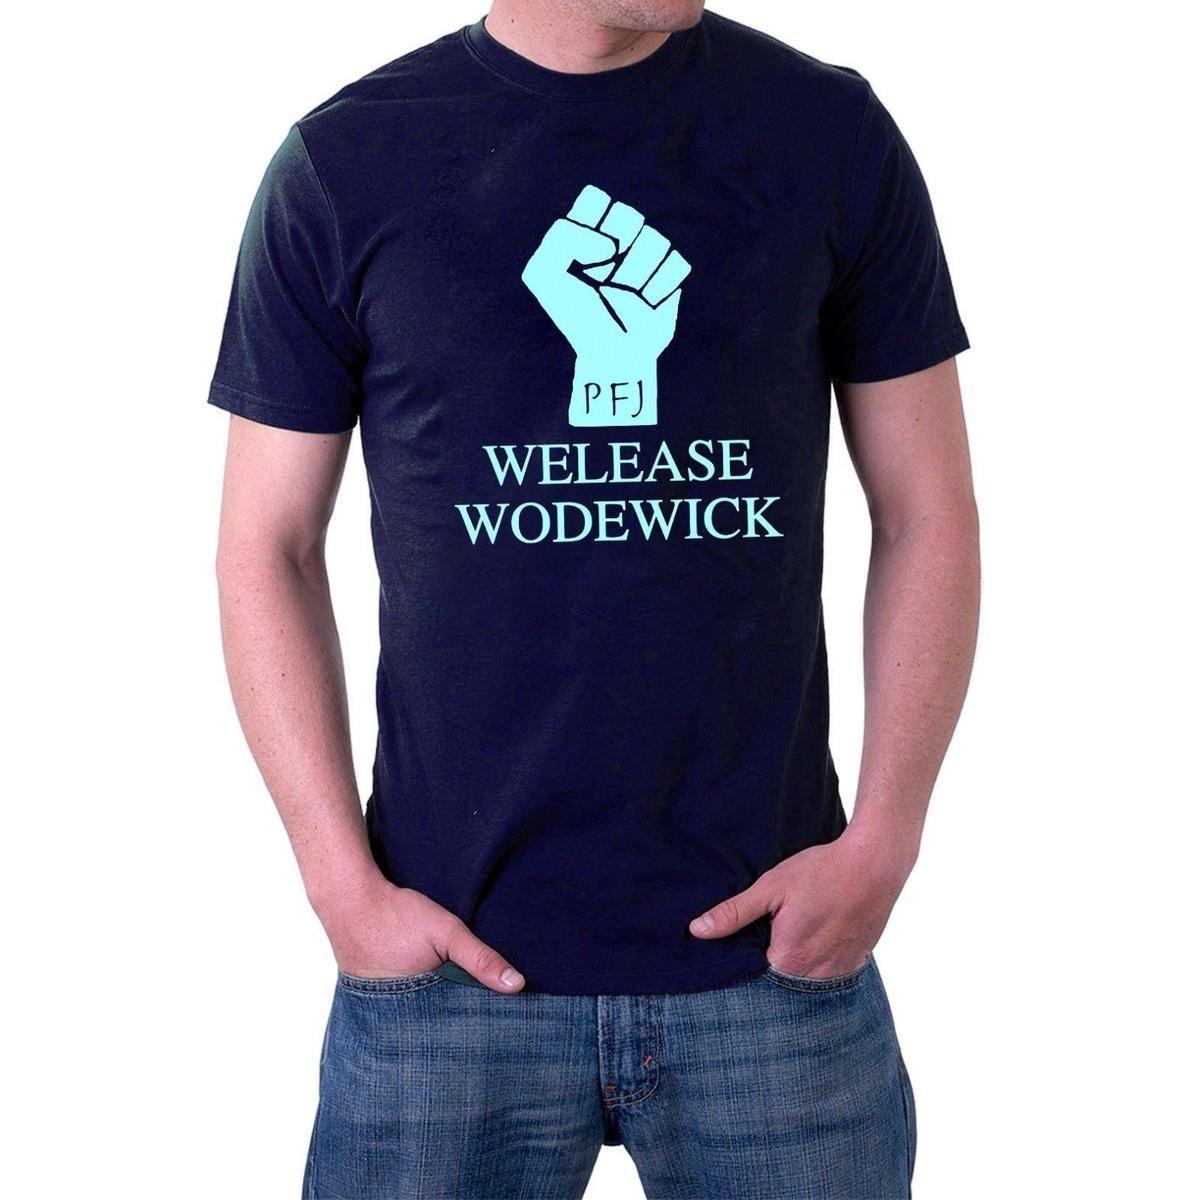 Satın Al Monty Python Tişört Parodi Welease Wodewick Brianın